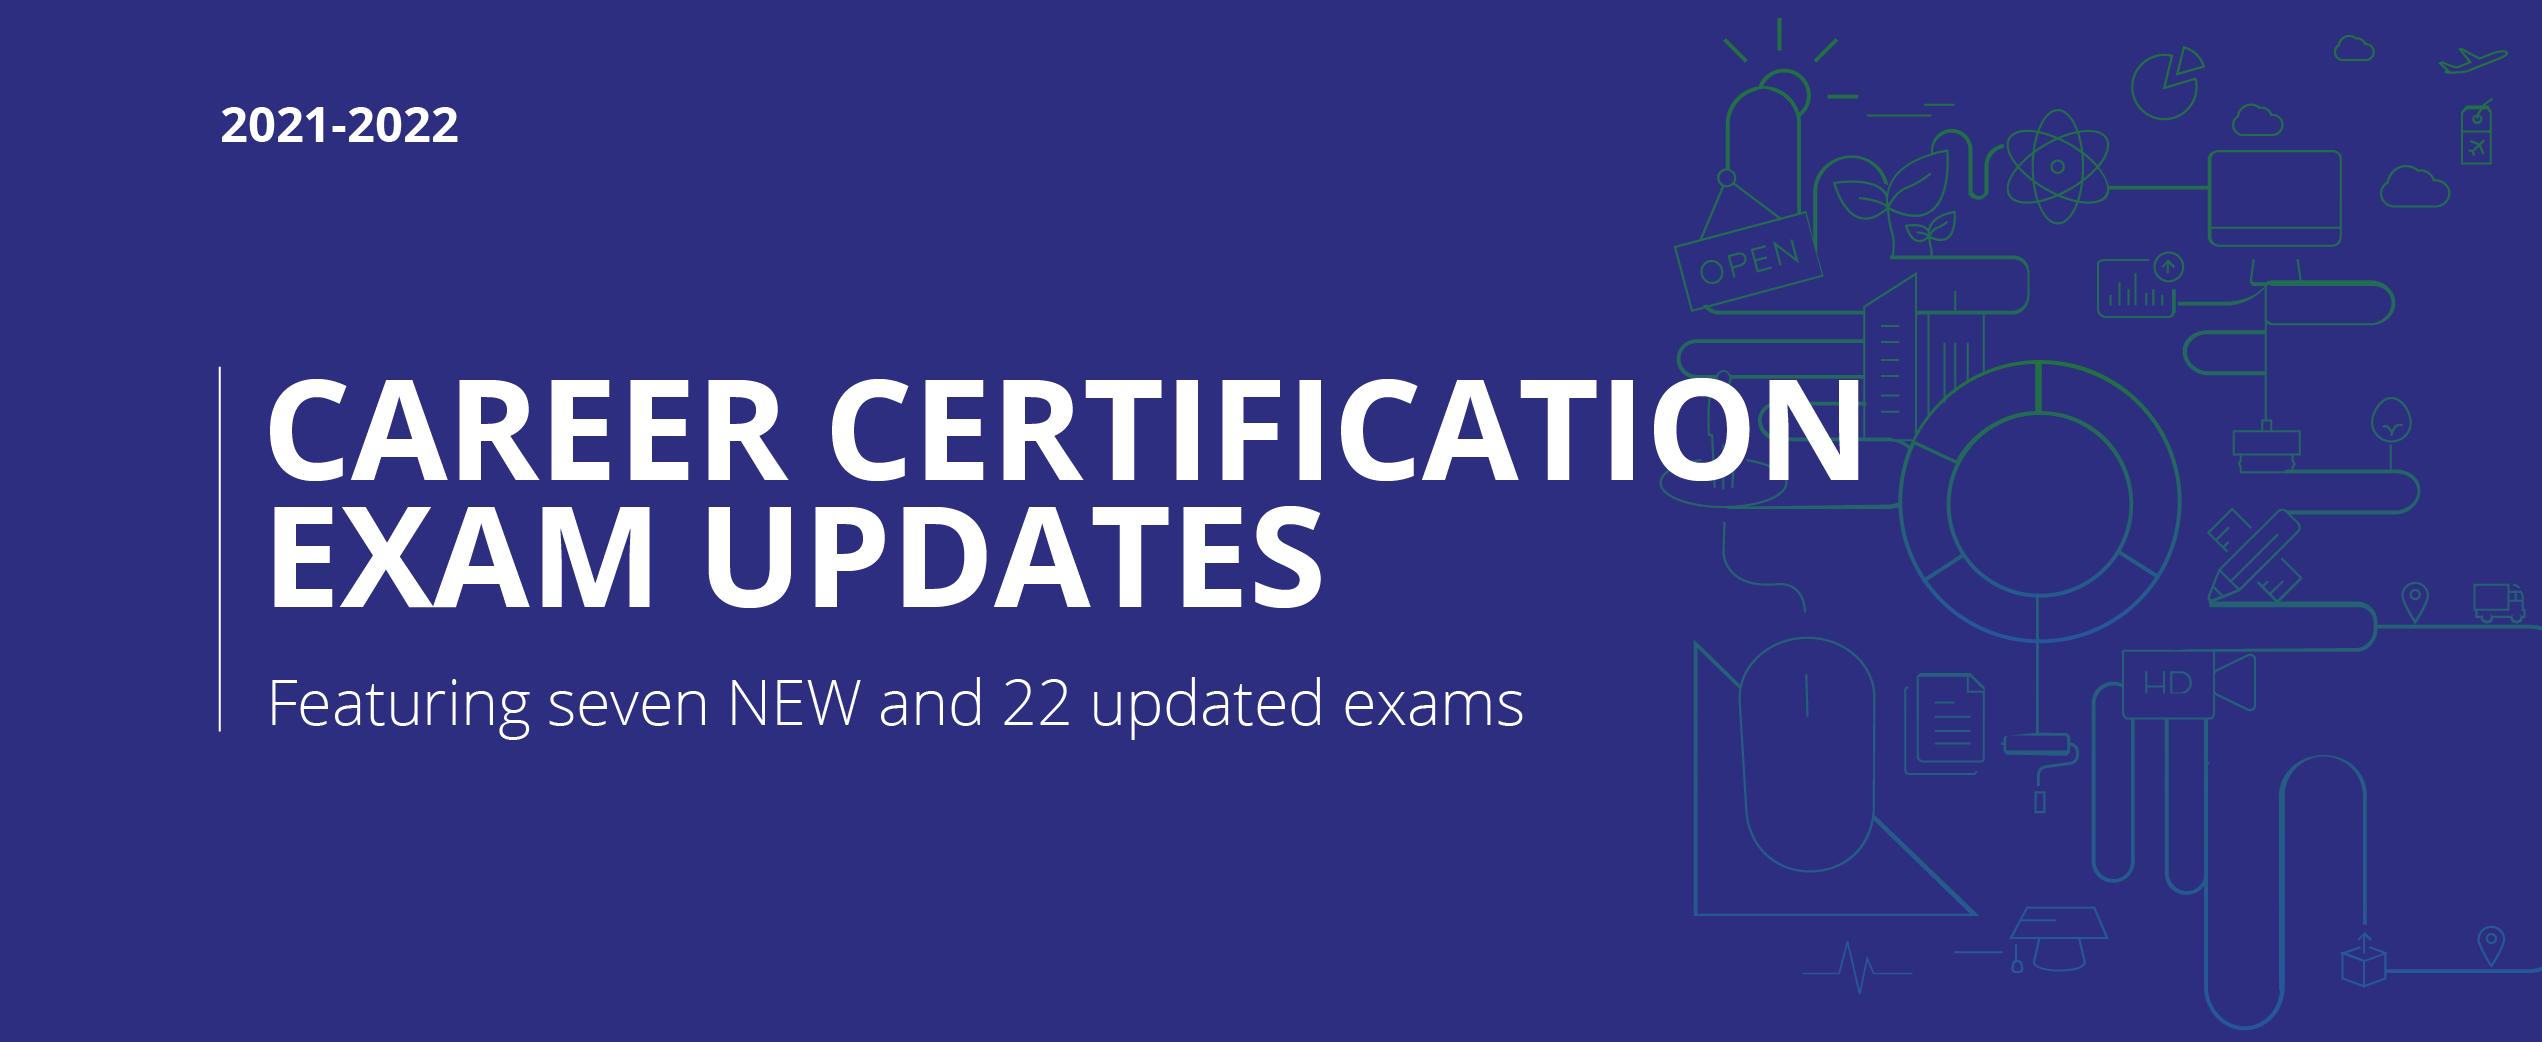 2021-2022 Career Certification Exam Updates